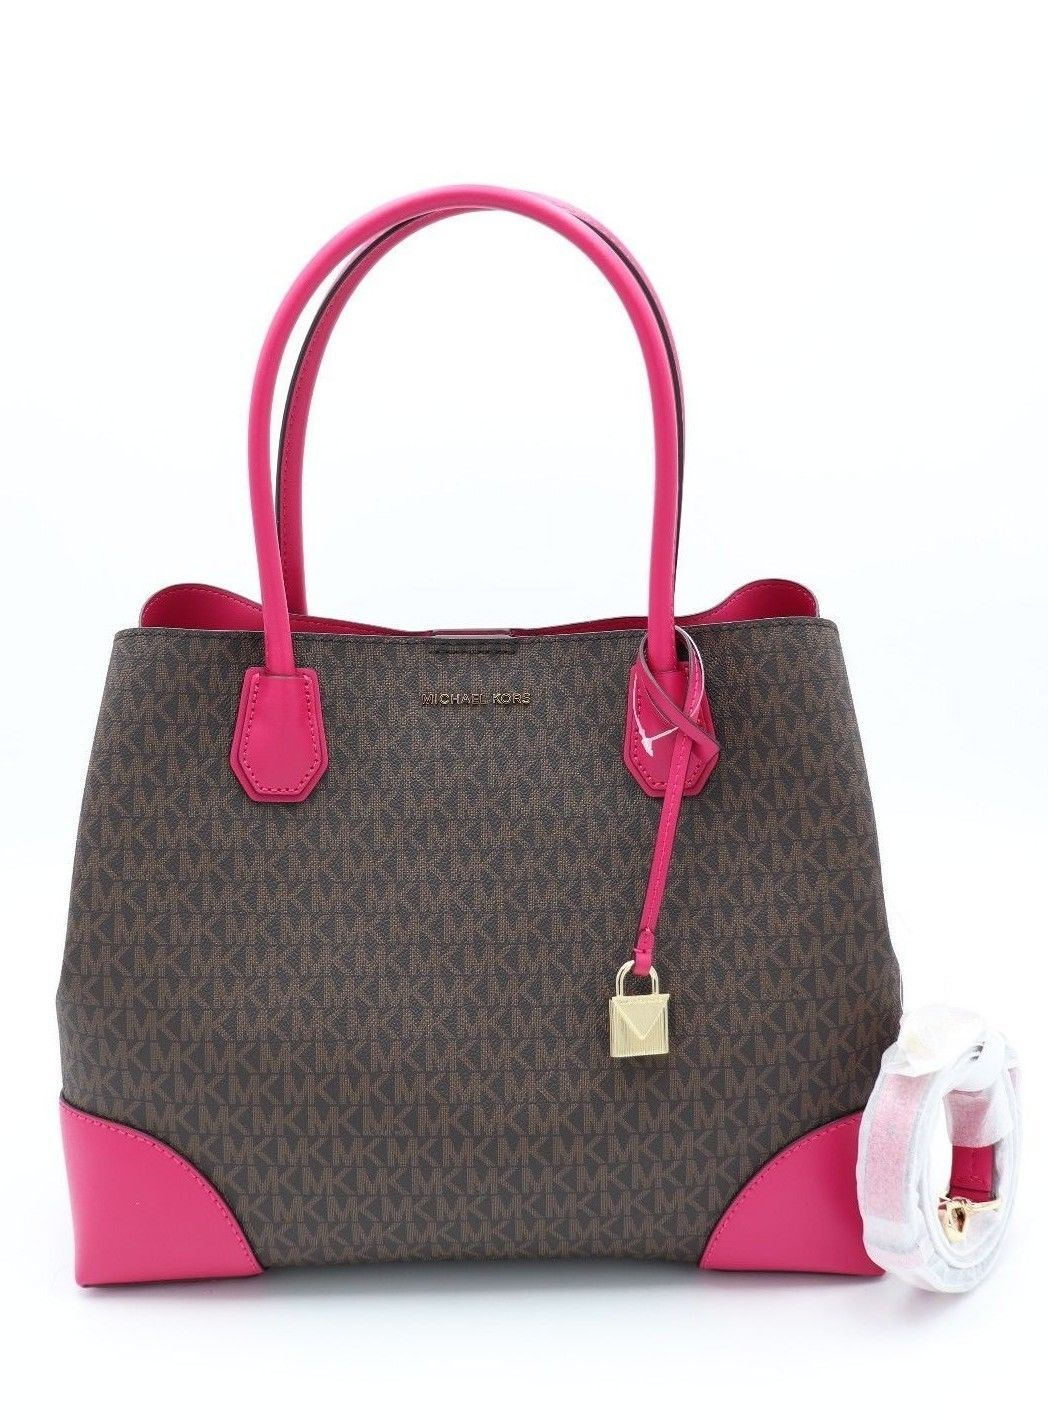 b62e084e5f722 NWT MICHAEL Michael Kors Mercer Gallery Brown Pink Signature Center Zip Tote  Bag  198.0  michael  kors  handbag